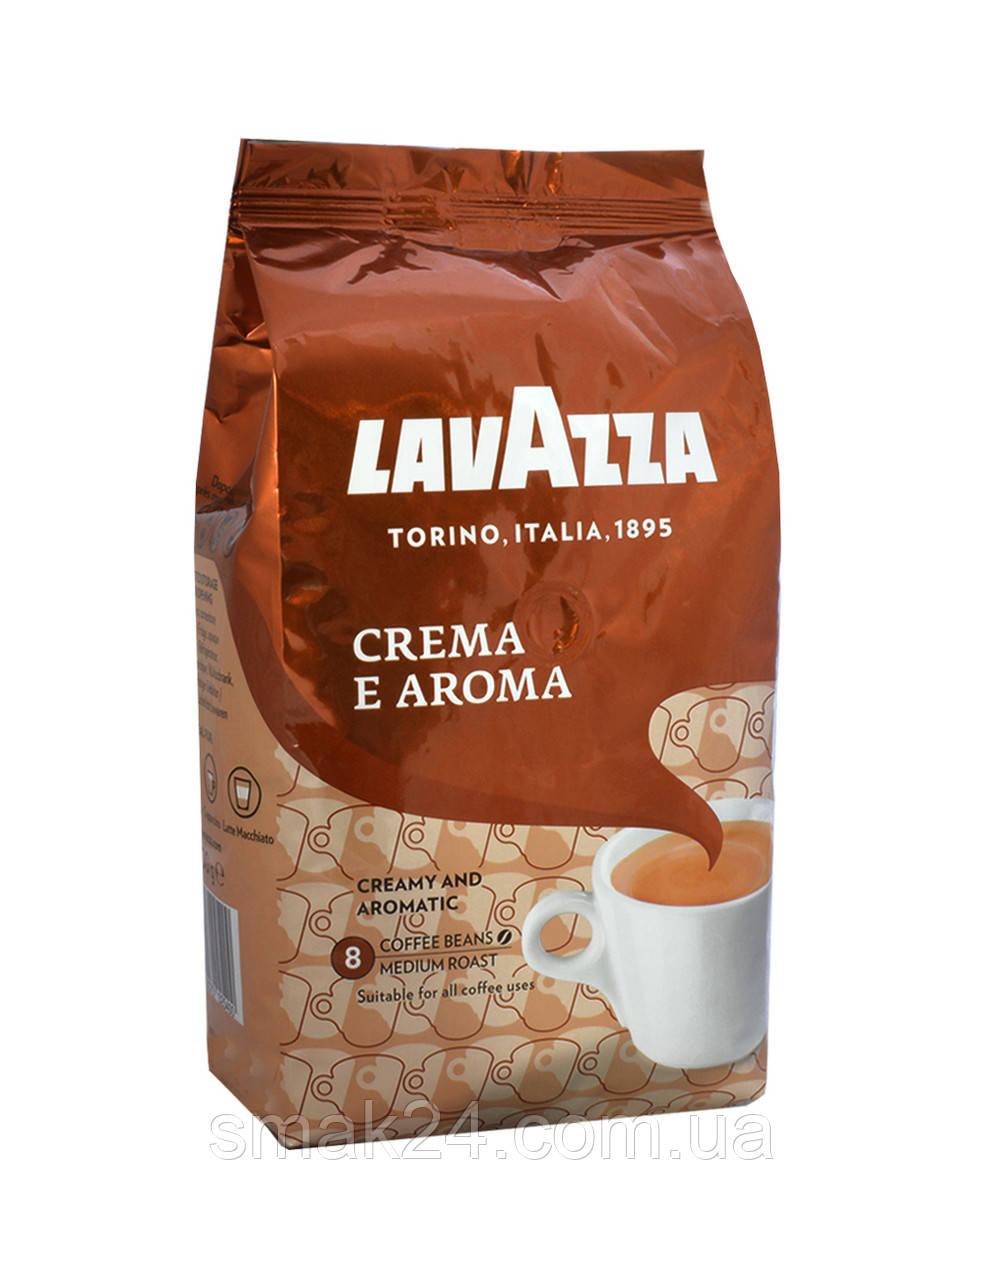 Кофе в зернах LavAzza Crema e Aroma 1 кг Италия